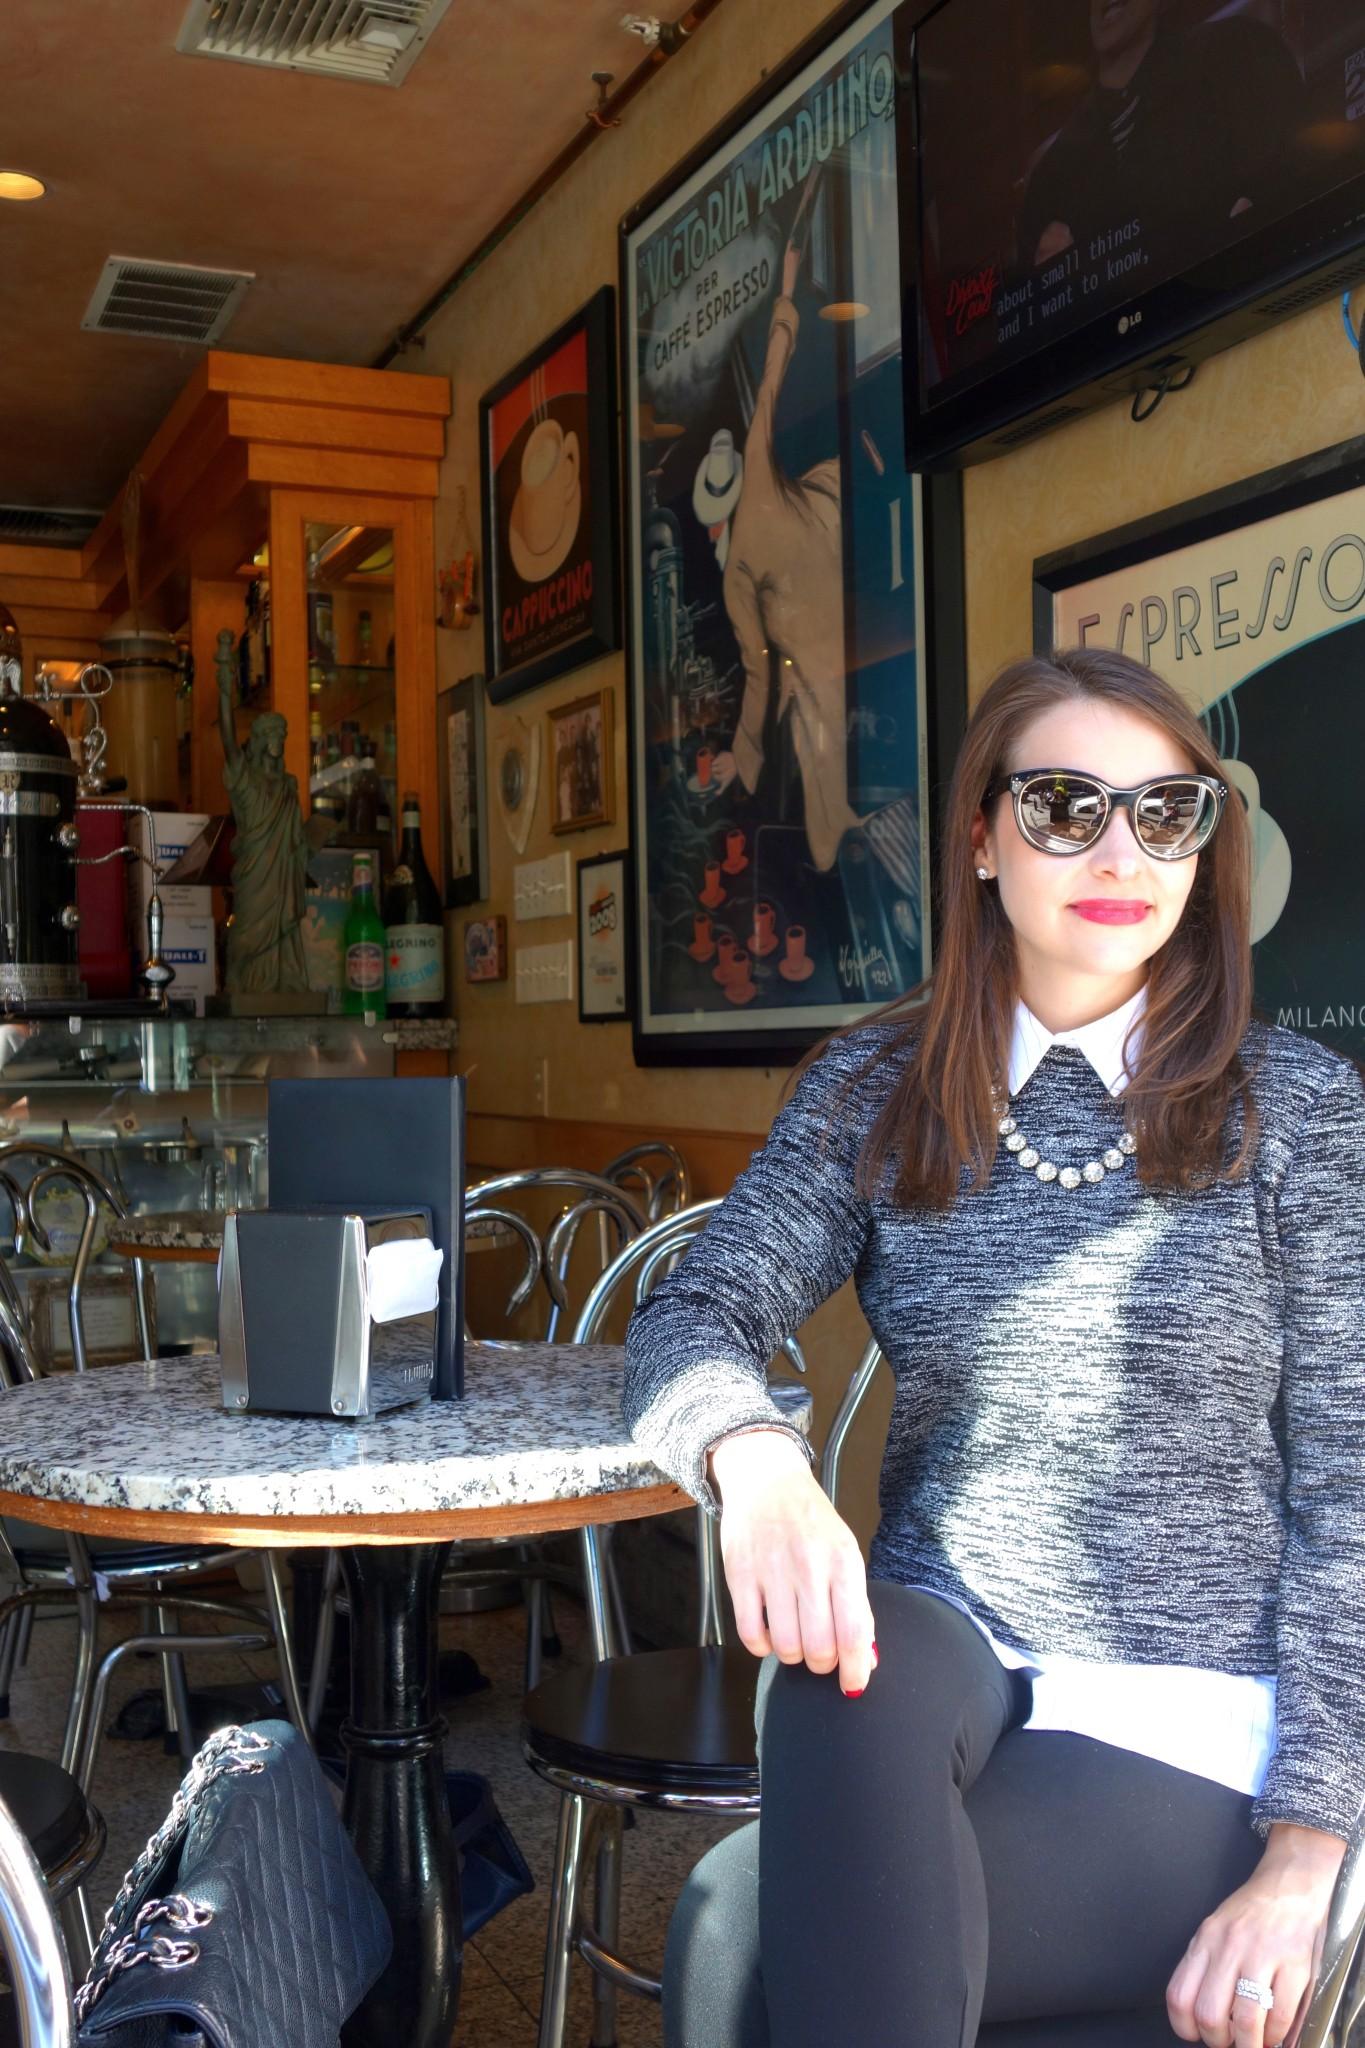 caffè vittoria, boston - the-alyst.com